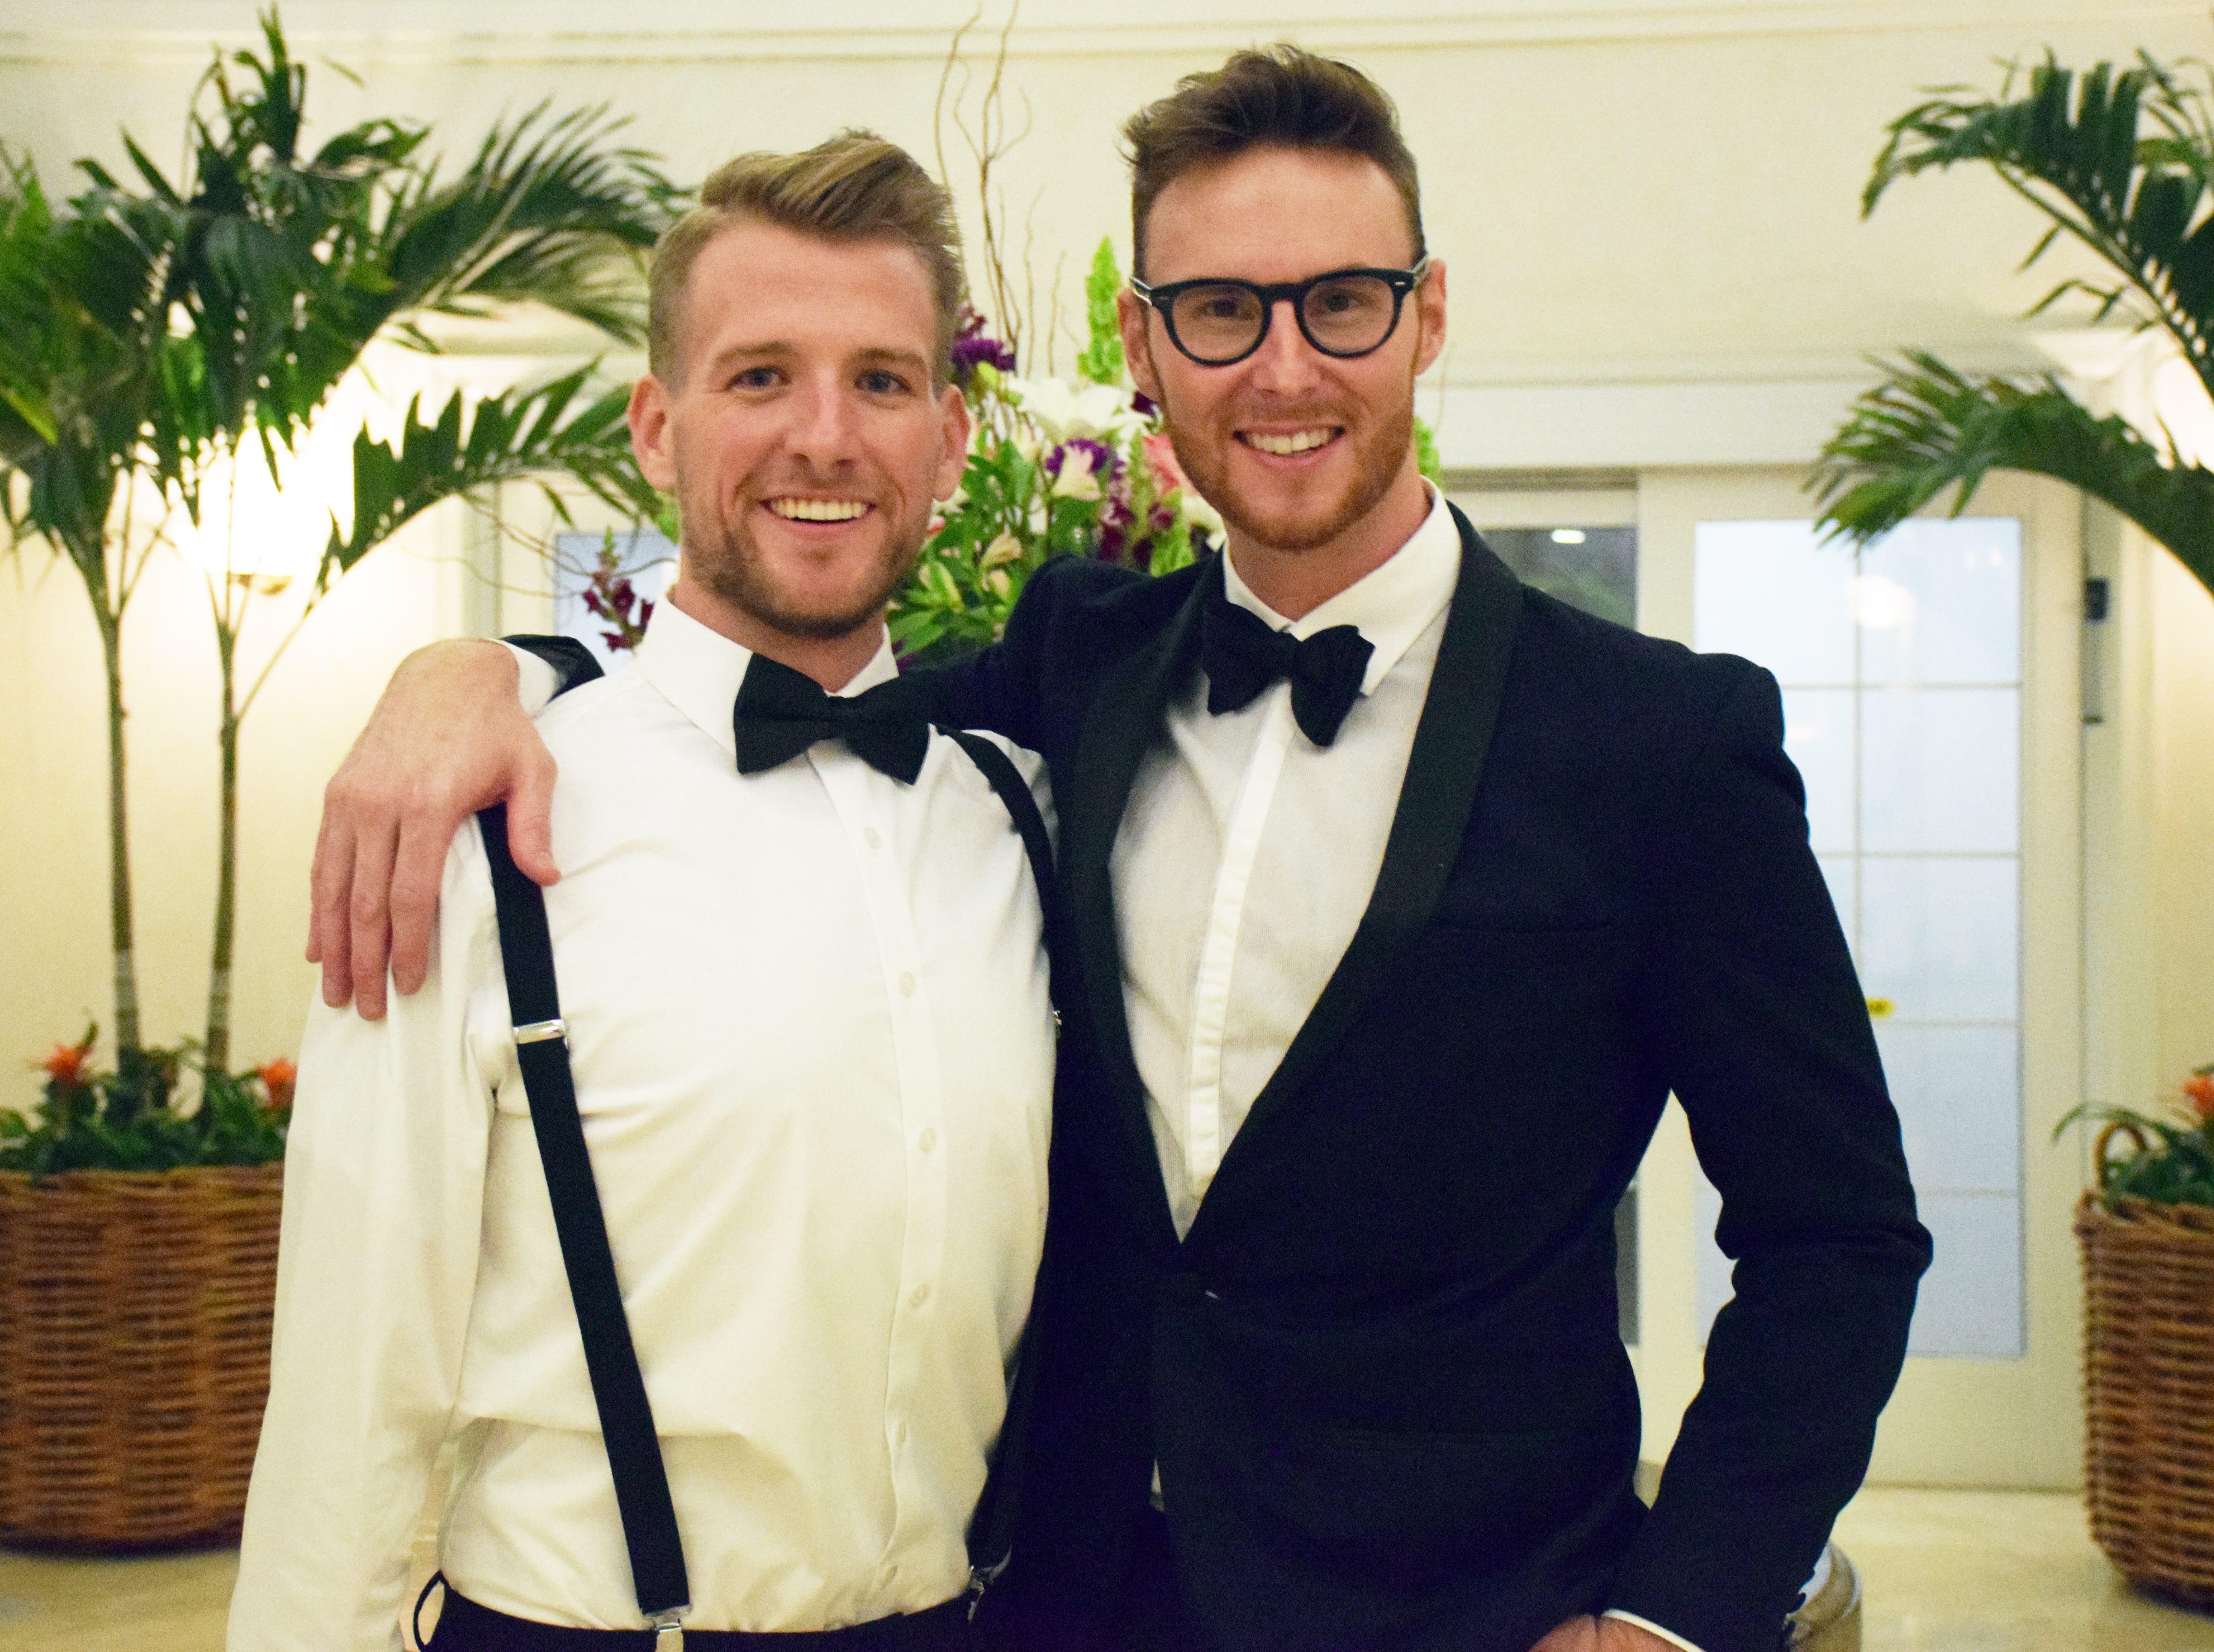 Phillip Dk And Jesse Strang